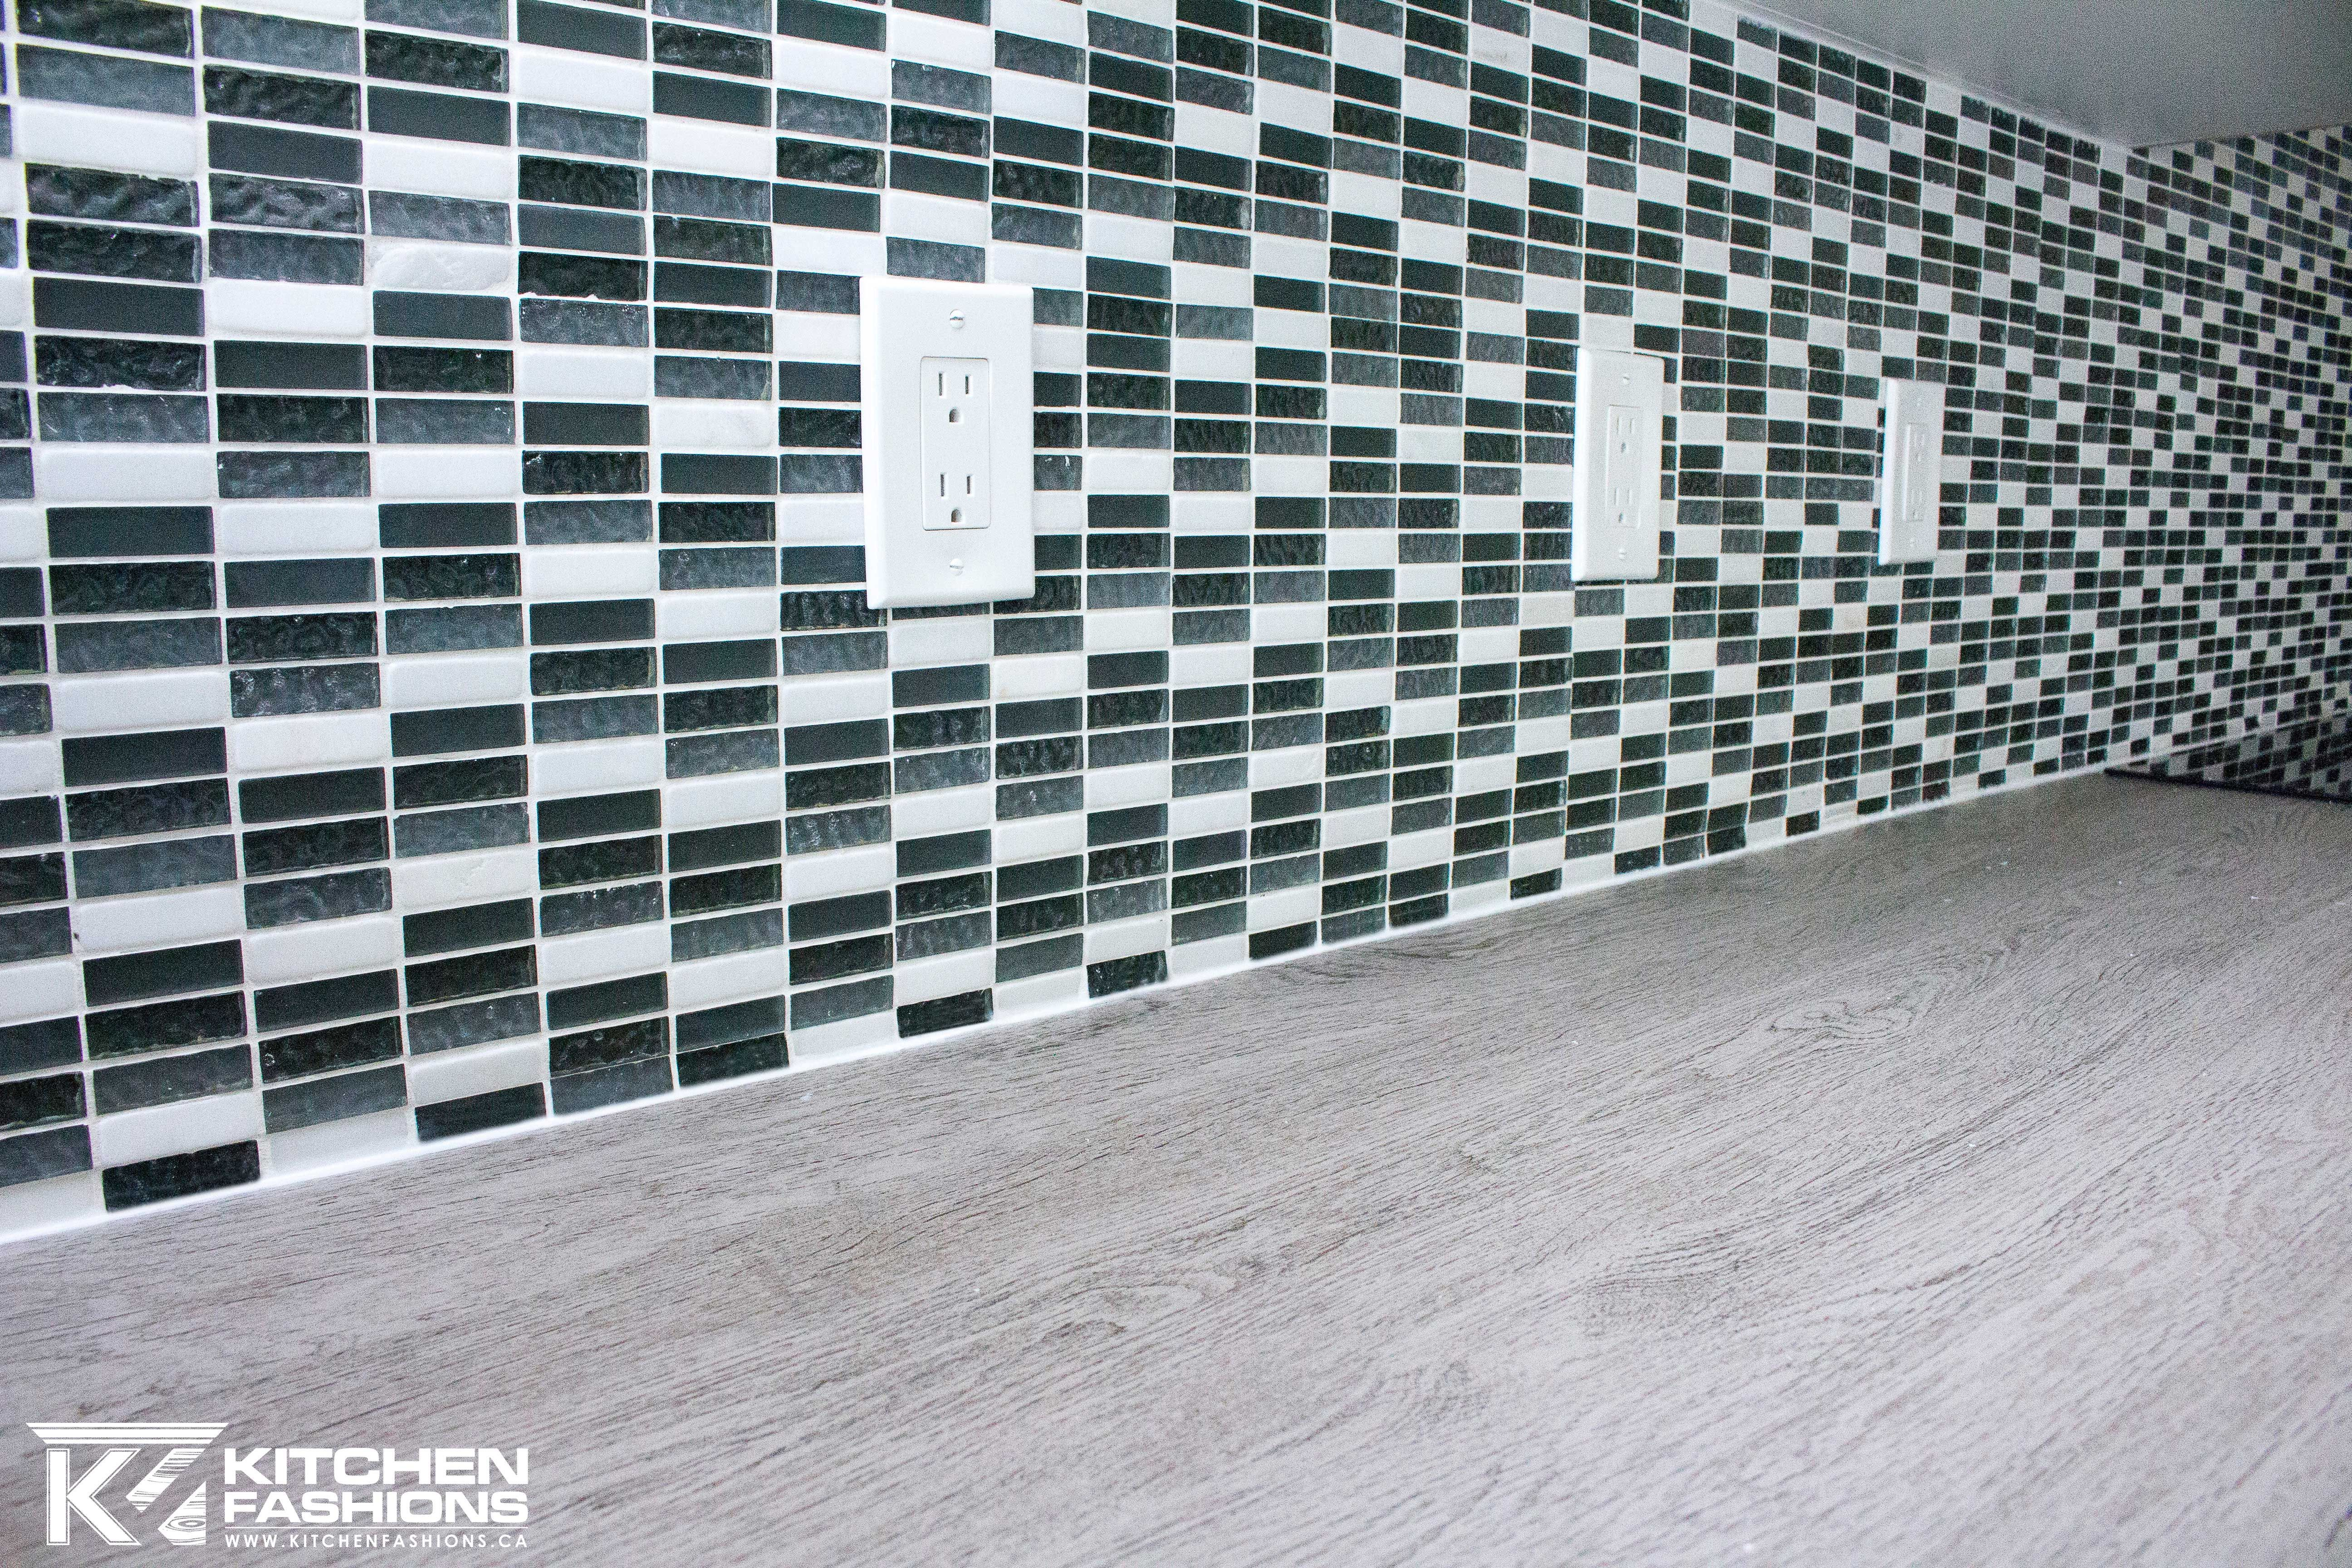 Black white and grey small tile backsplash backsplash trends black white and grey small tile backsplash dailygadgetfo Gallery